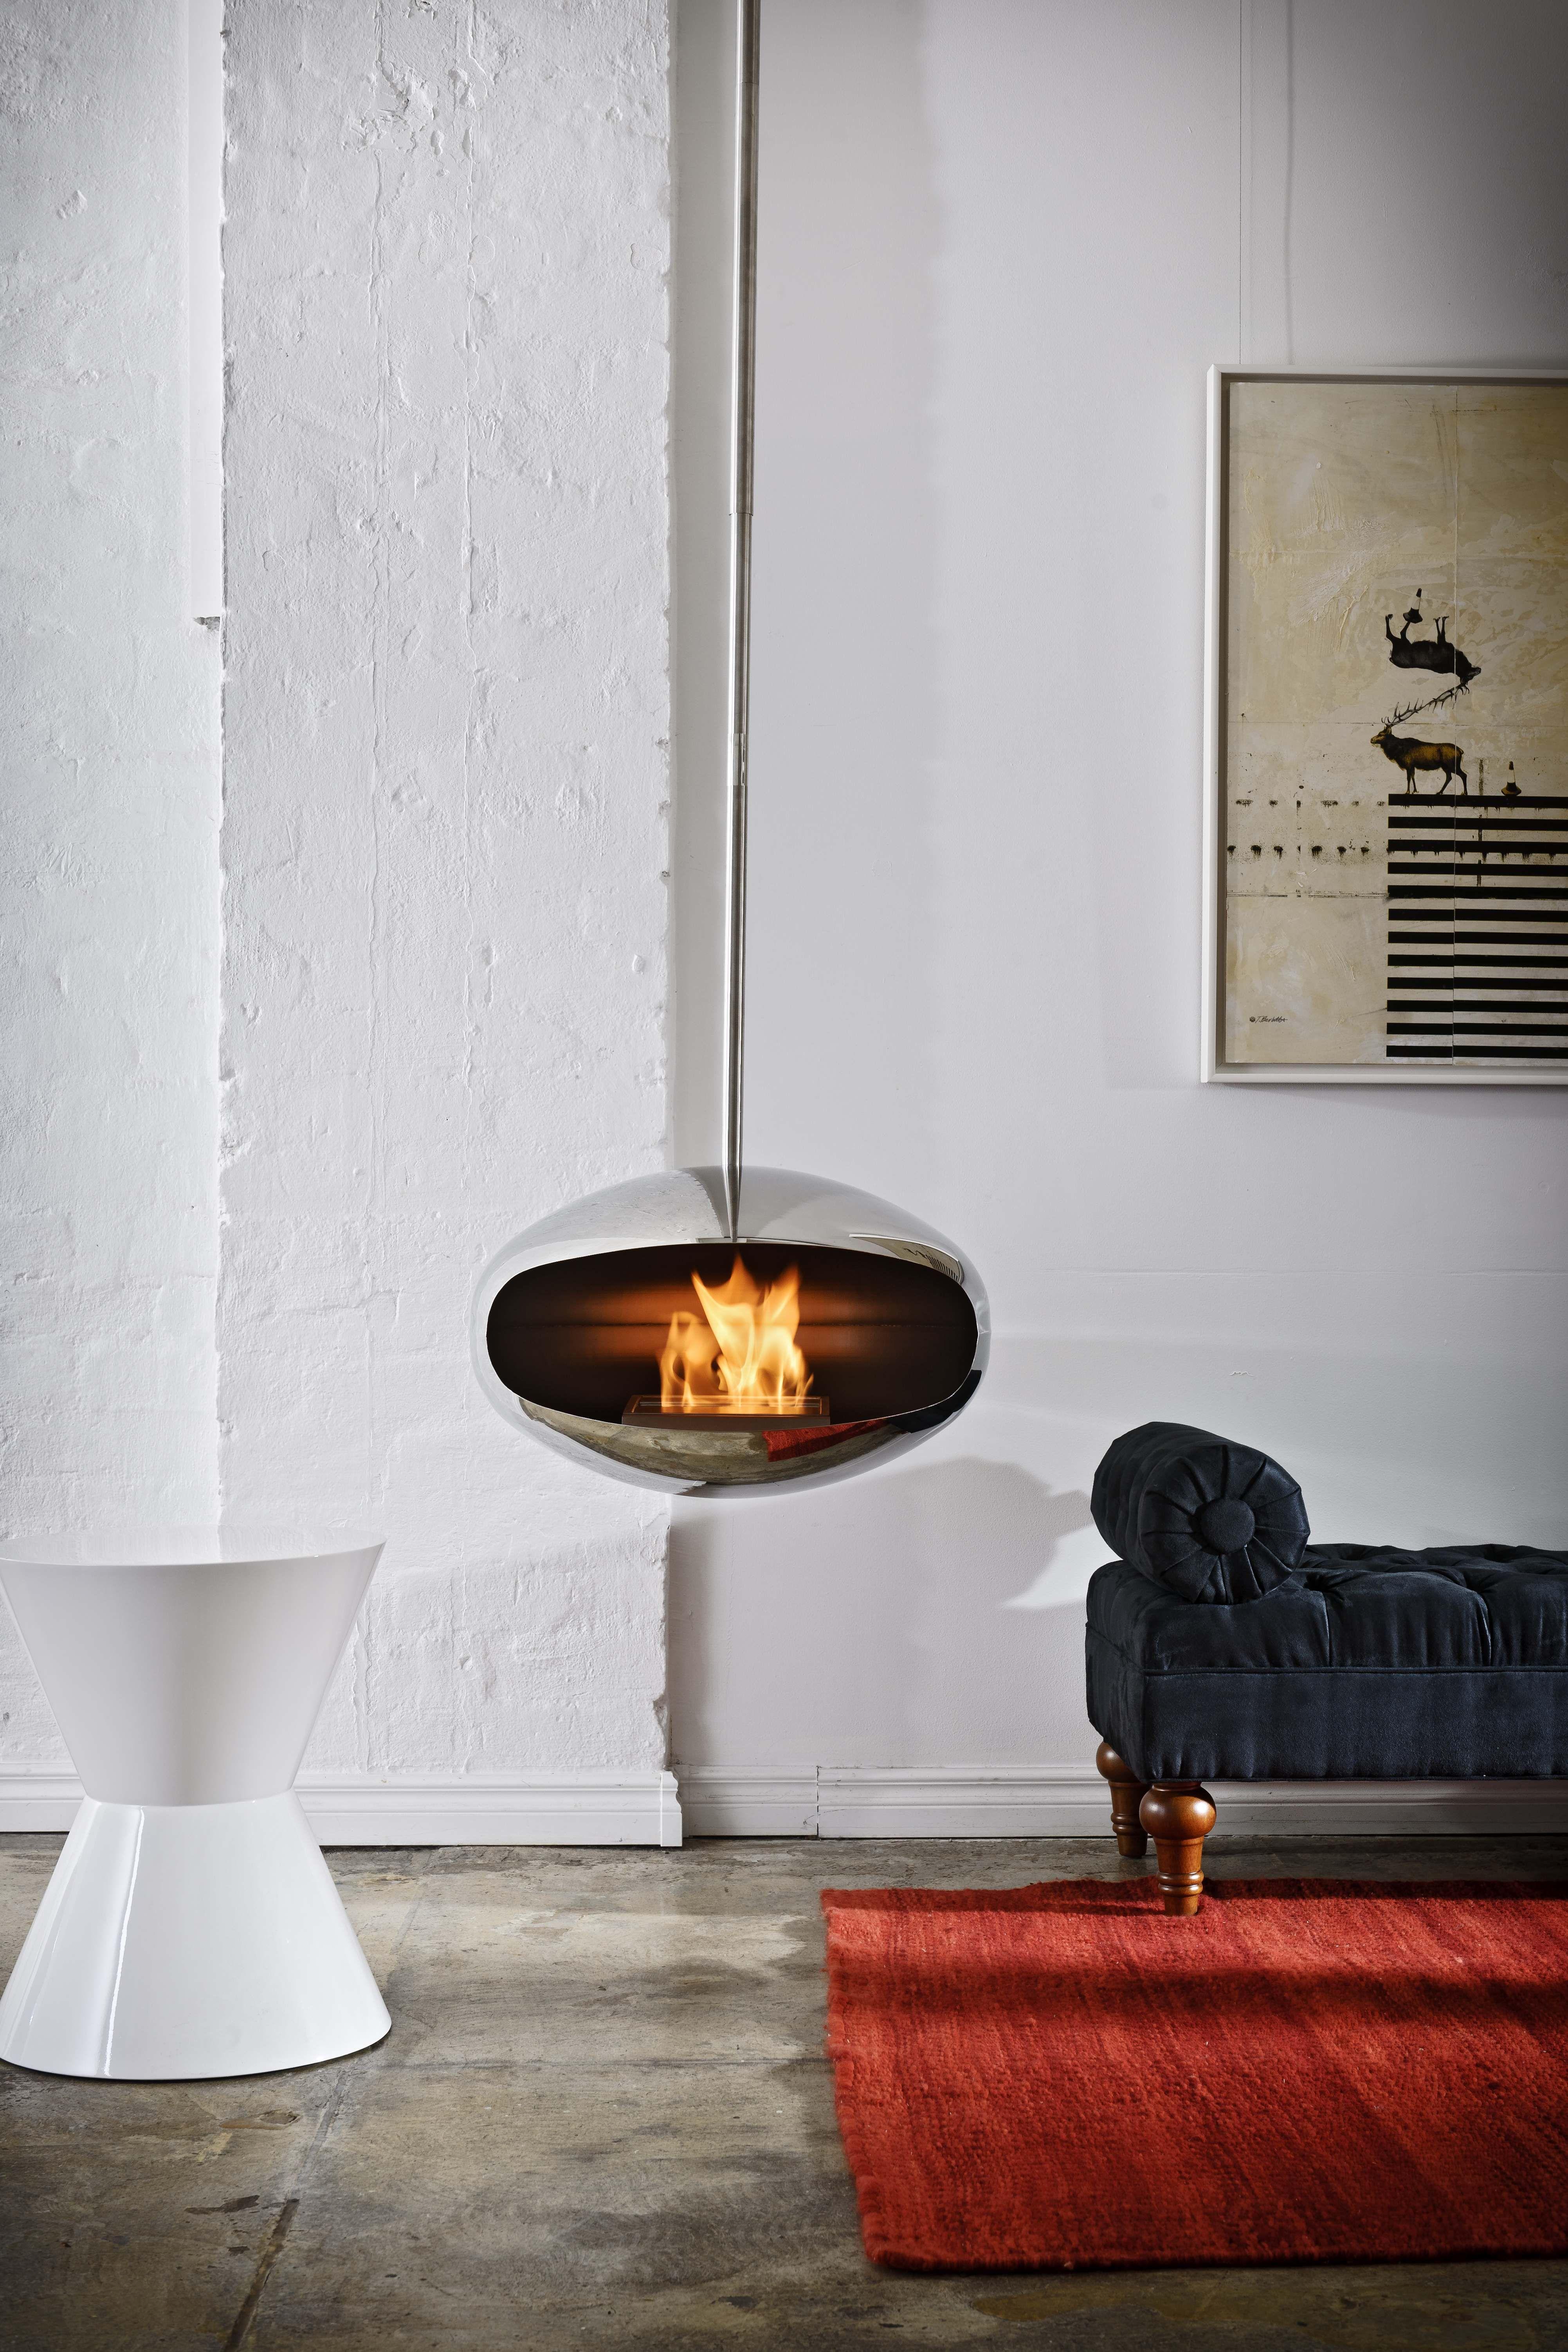 Cocoon aeris biofuel fire hanging fireplace interior